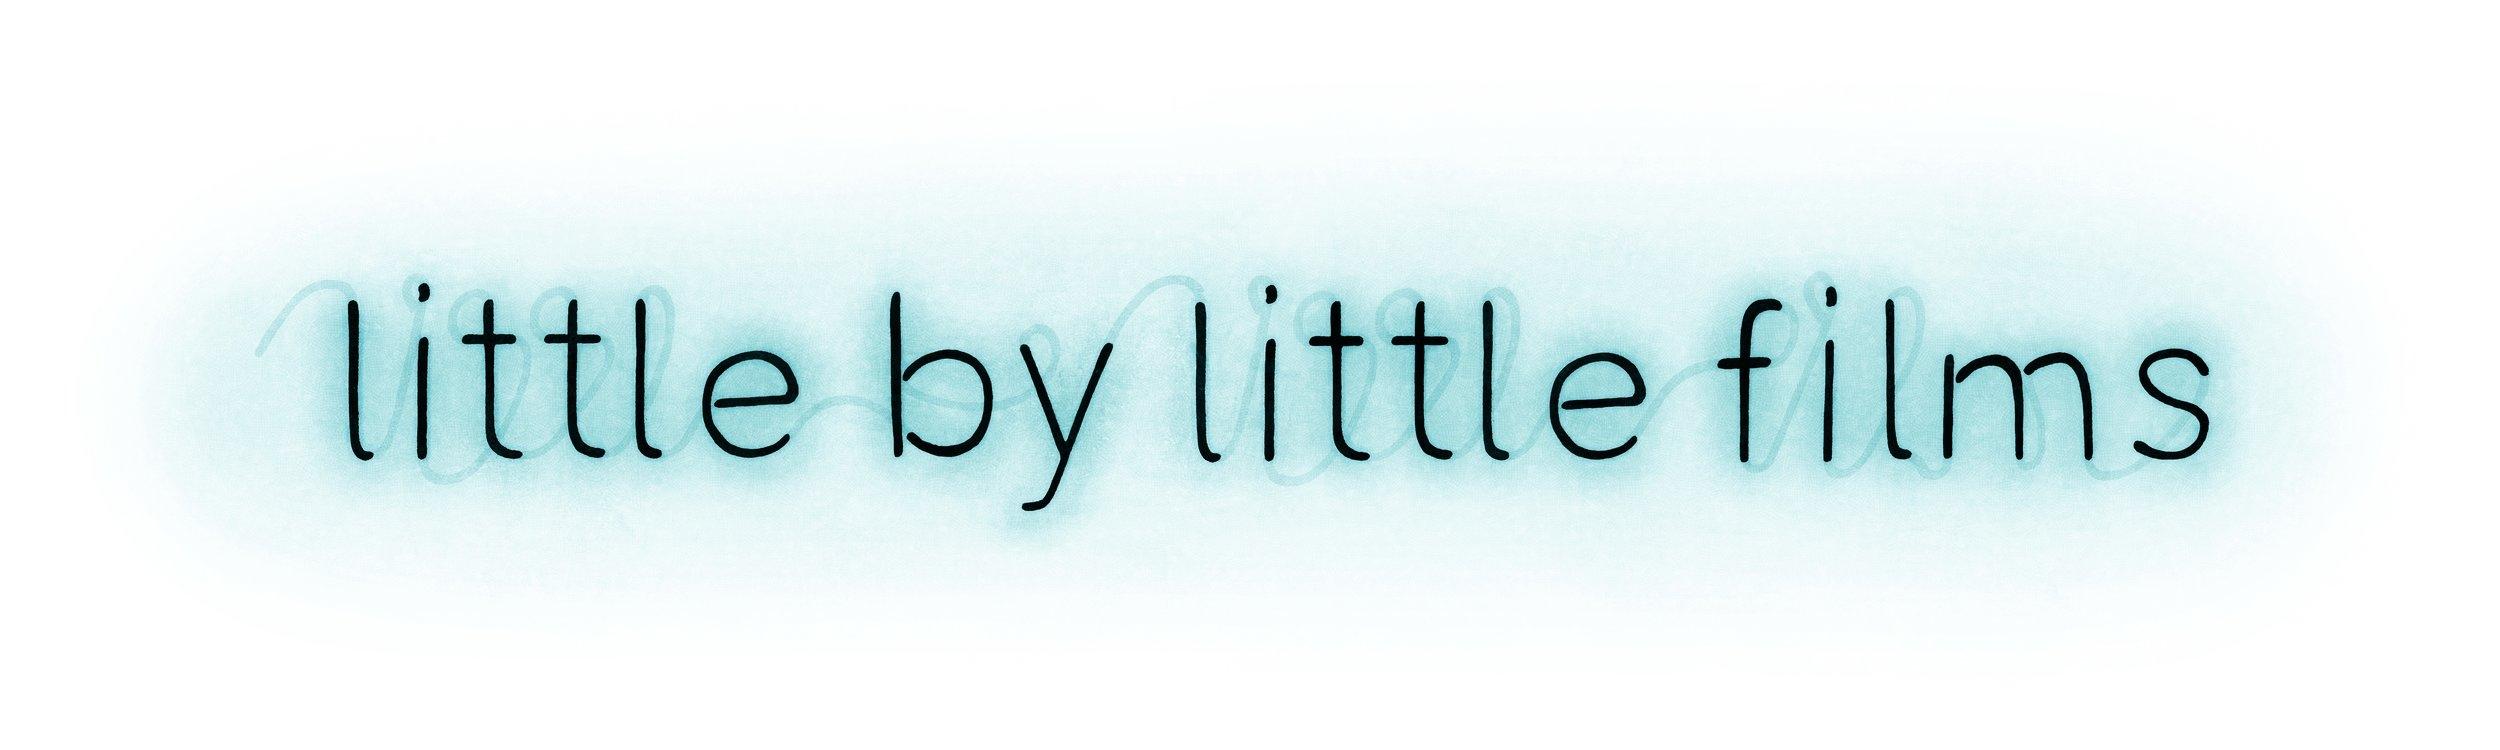 Little by little films logo white.jpg